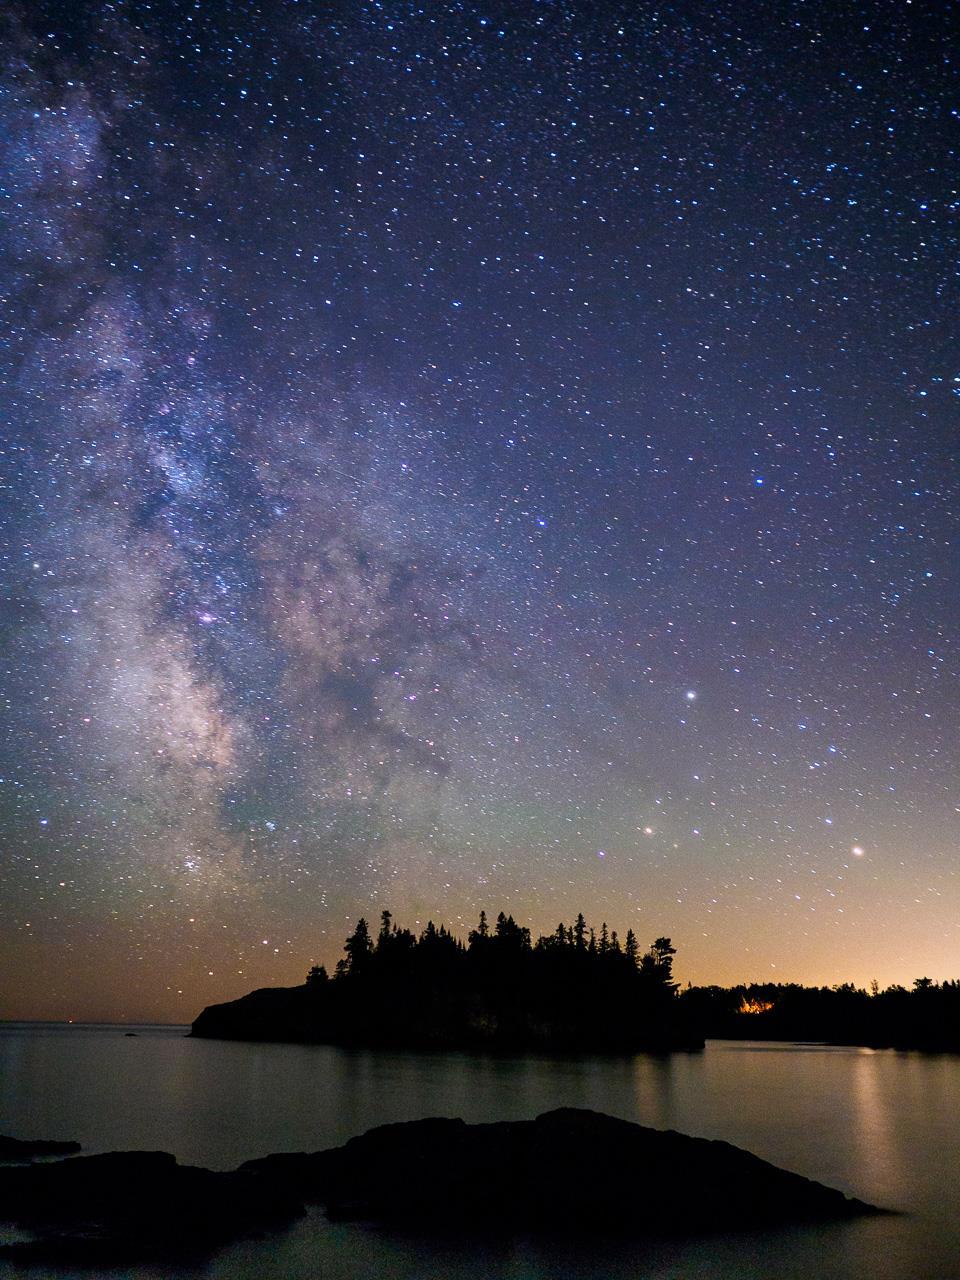 Млечный путь, Марибет Лунден / Maribeth Lundeen, Стиллуотер, Фотоконкурс Santa Fe Photographic